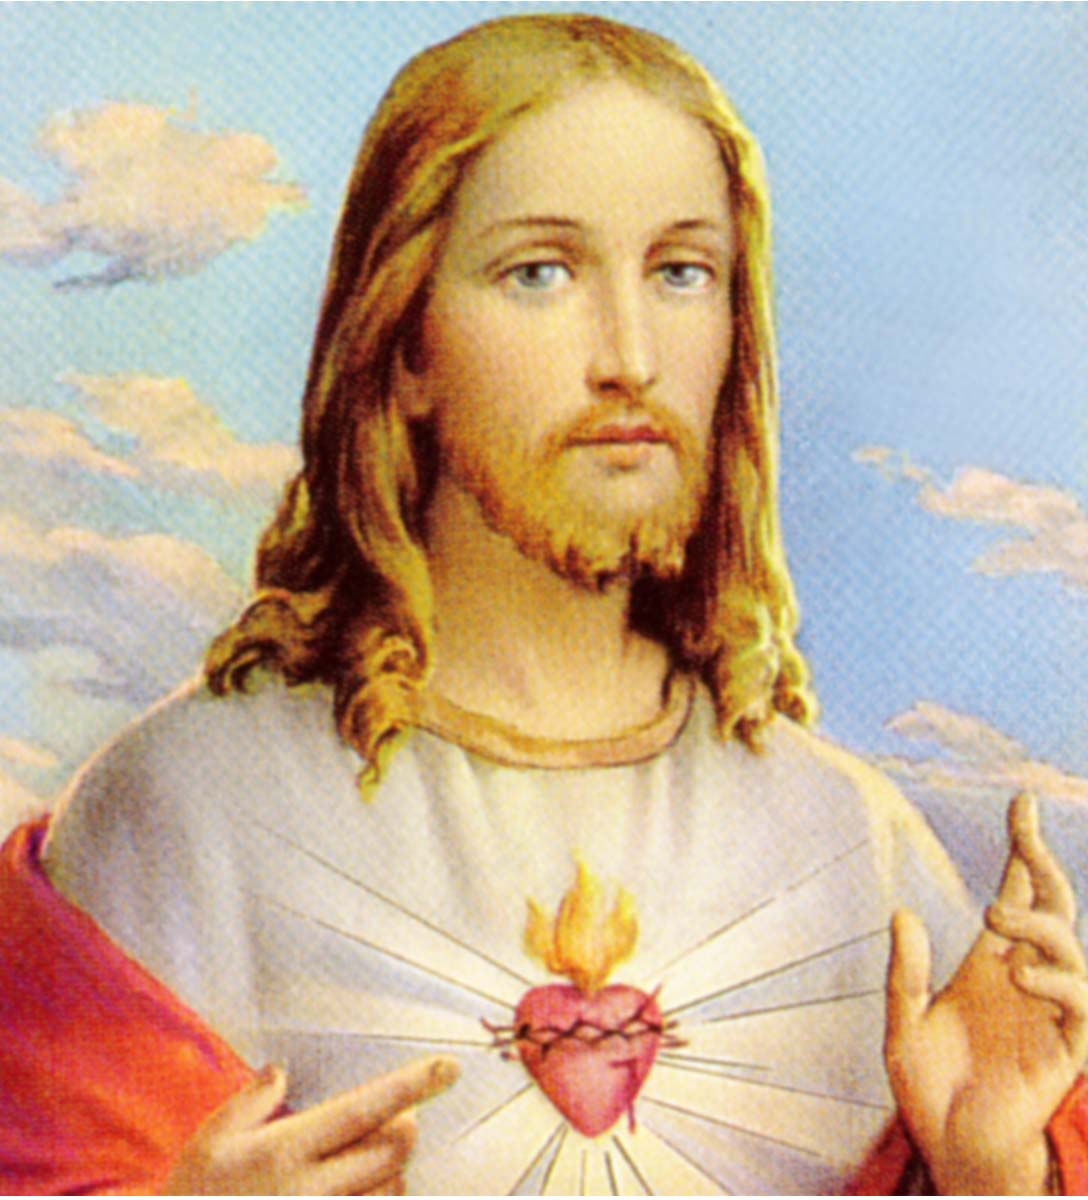 PNG Jesus Face - 69613